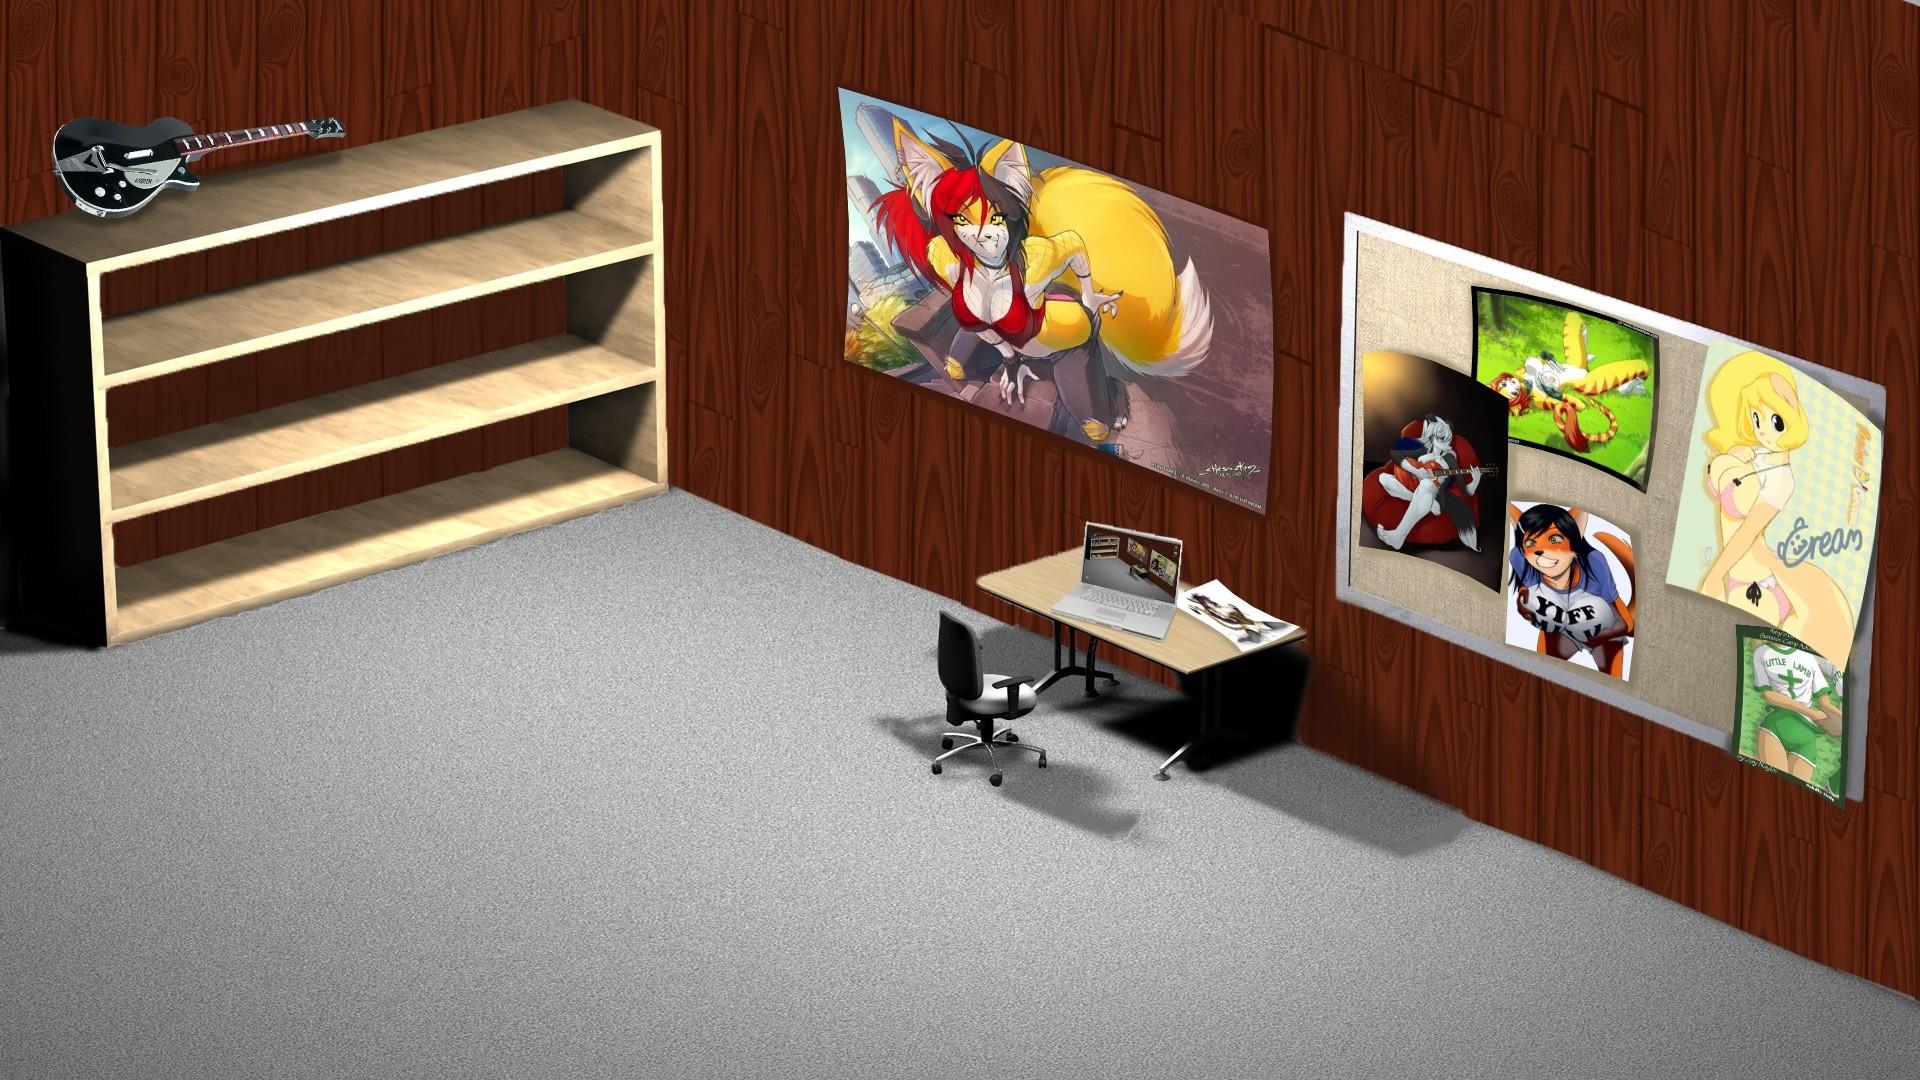 The Office Desktop Wallpaper 56 Images